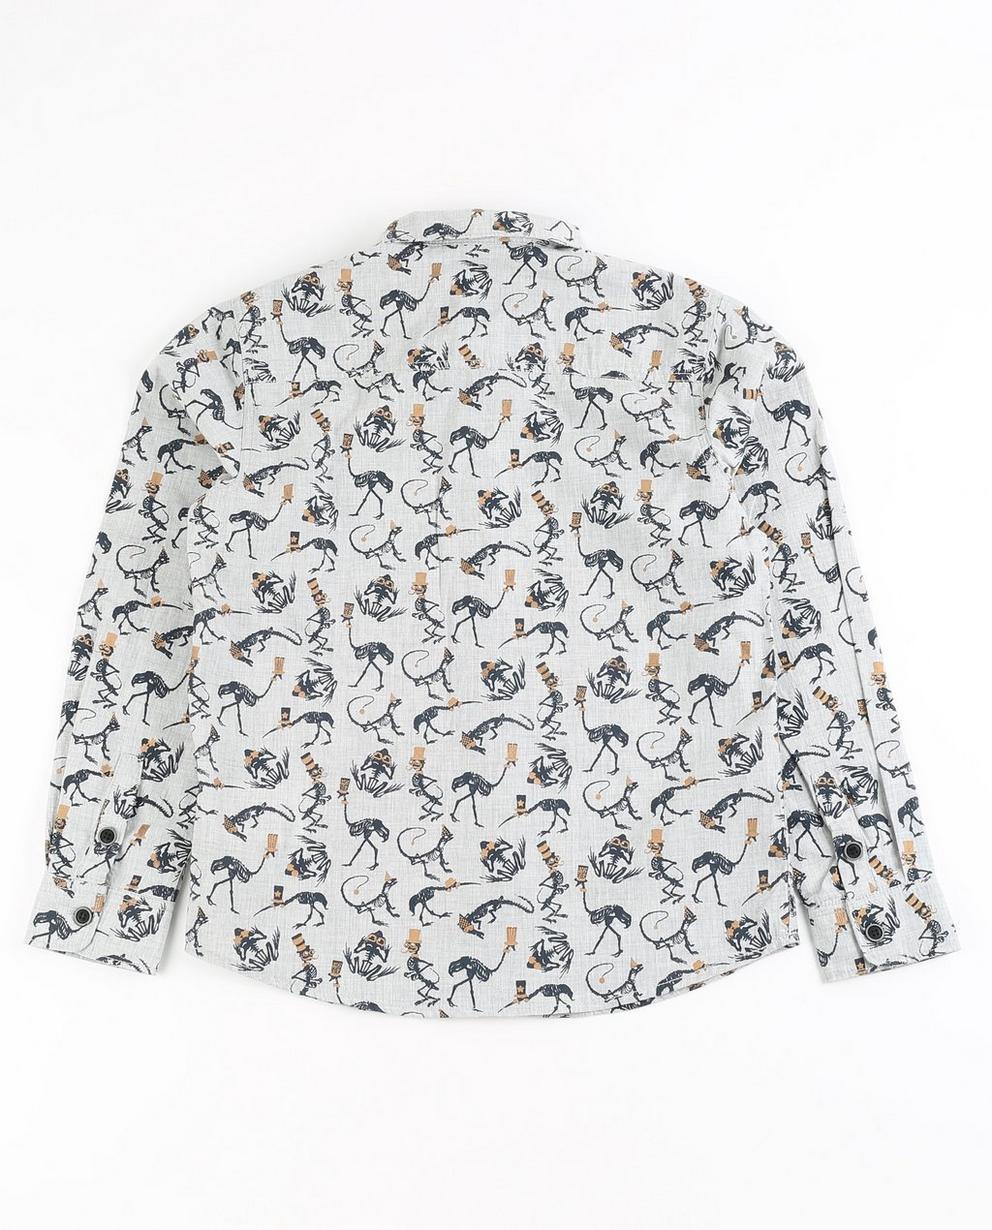 Hemden - Grau - Lichtgrijs hemd met allover print